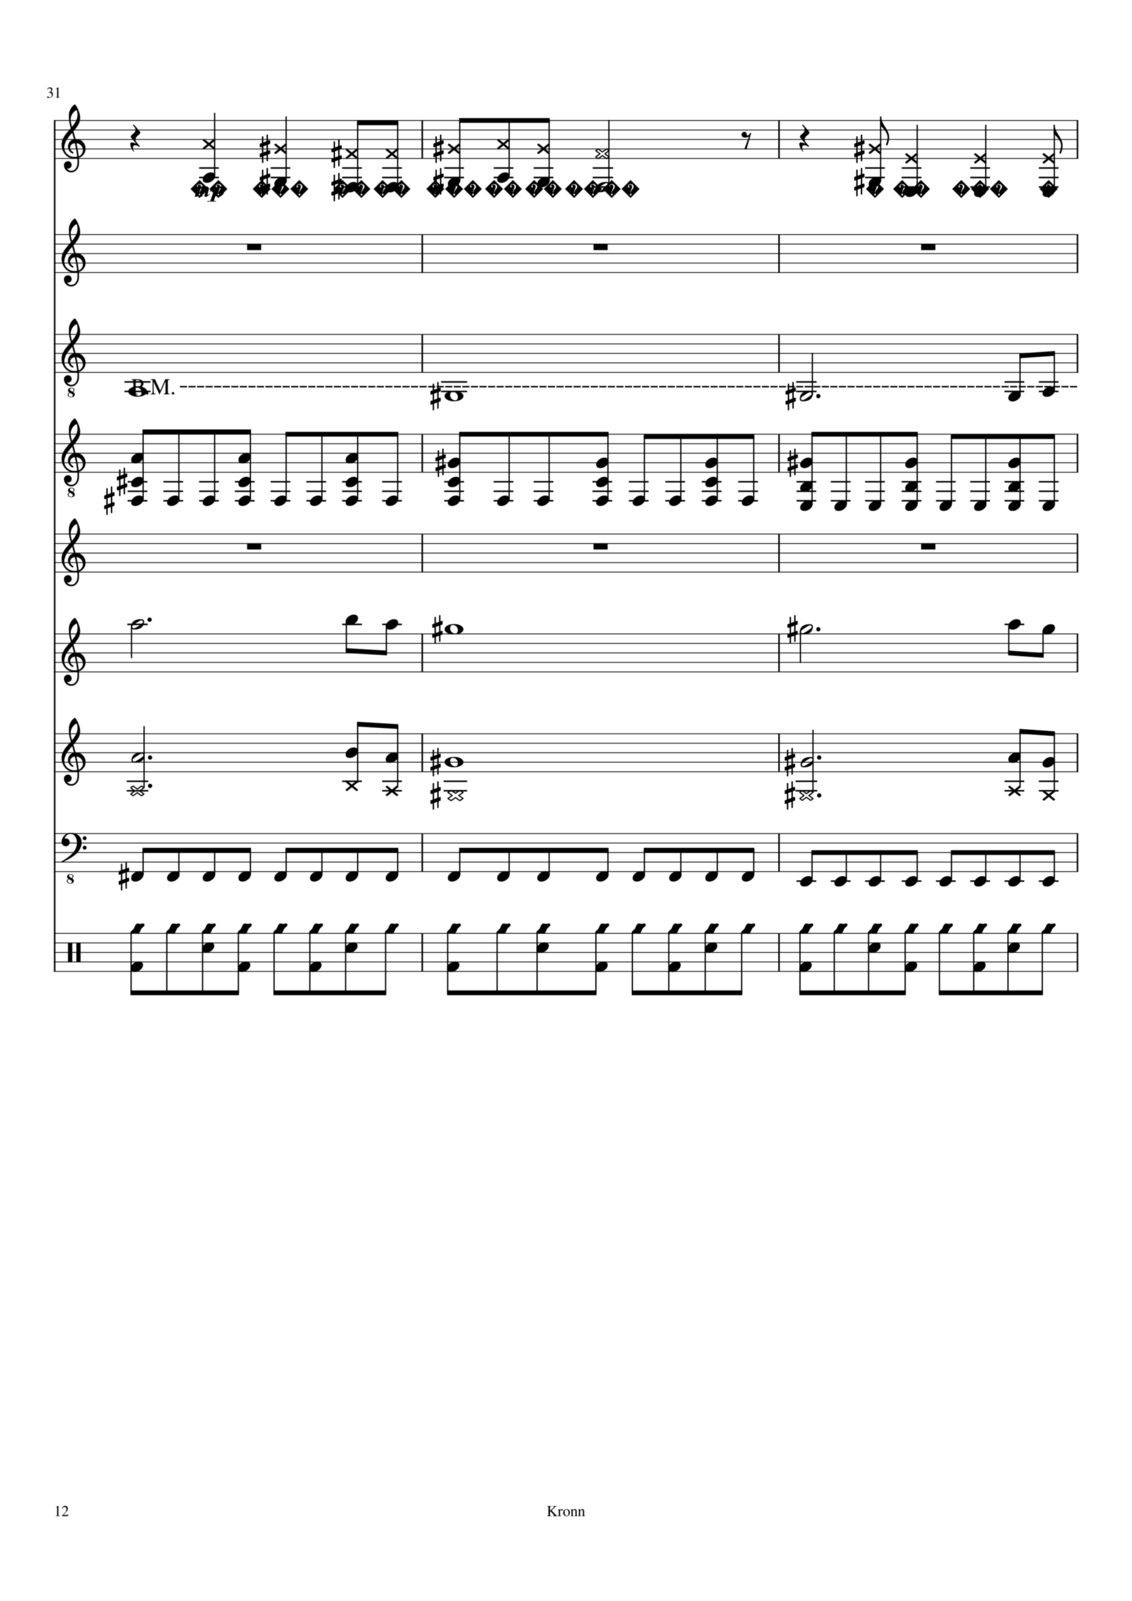 Ispoved Pervogo Boga slide, Image 12